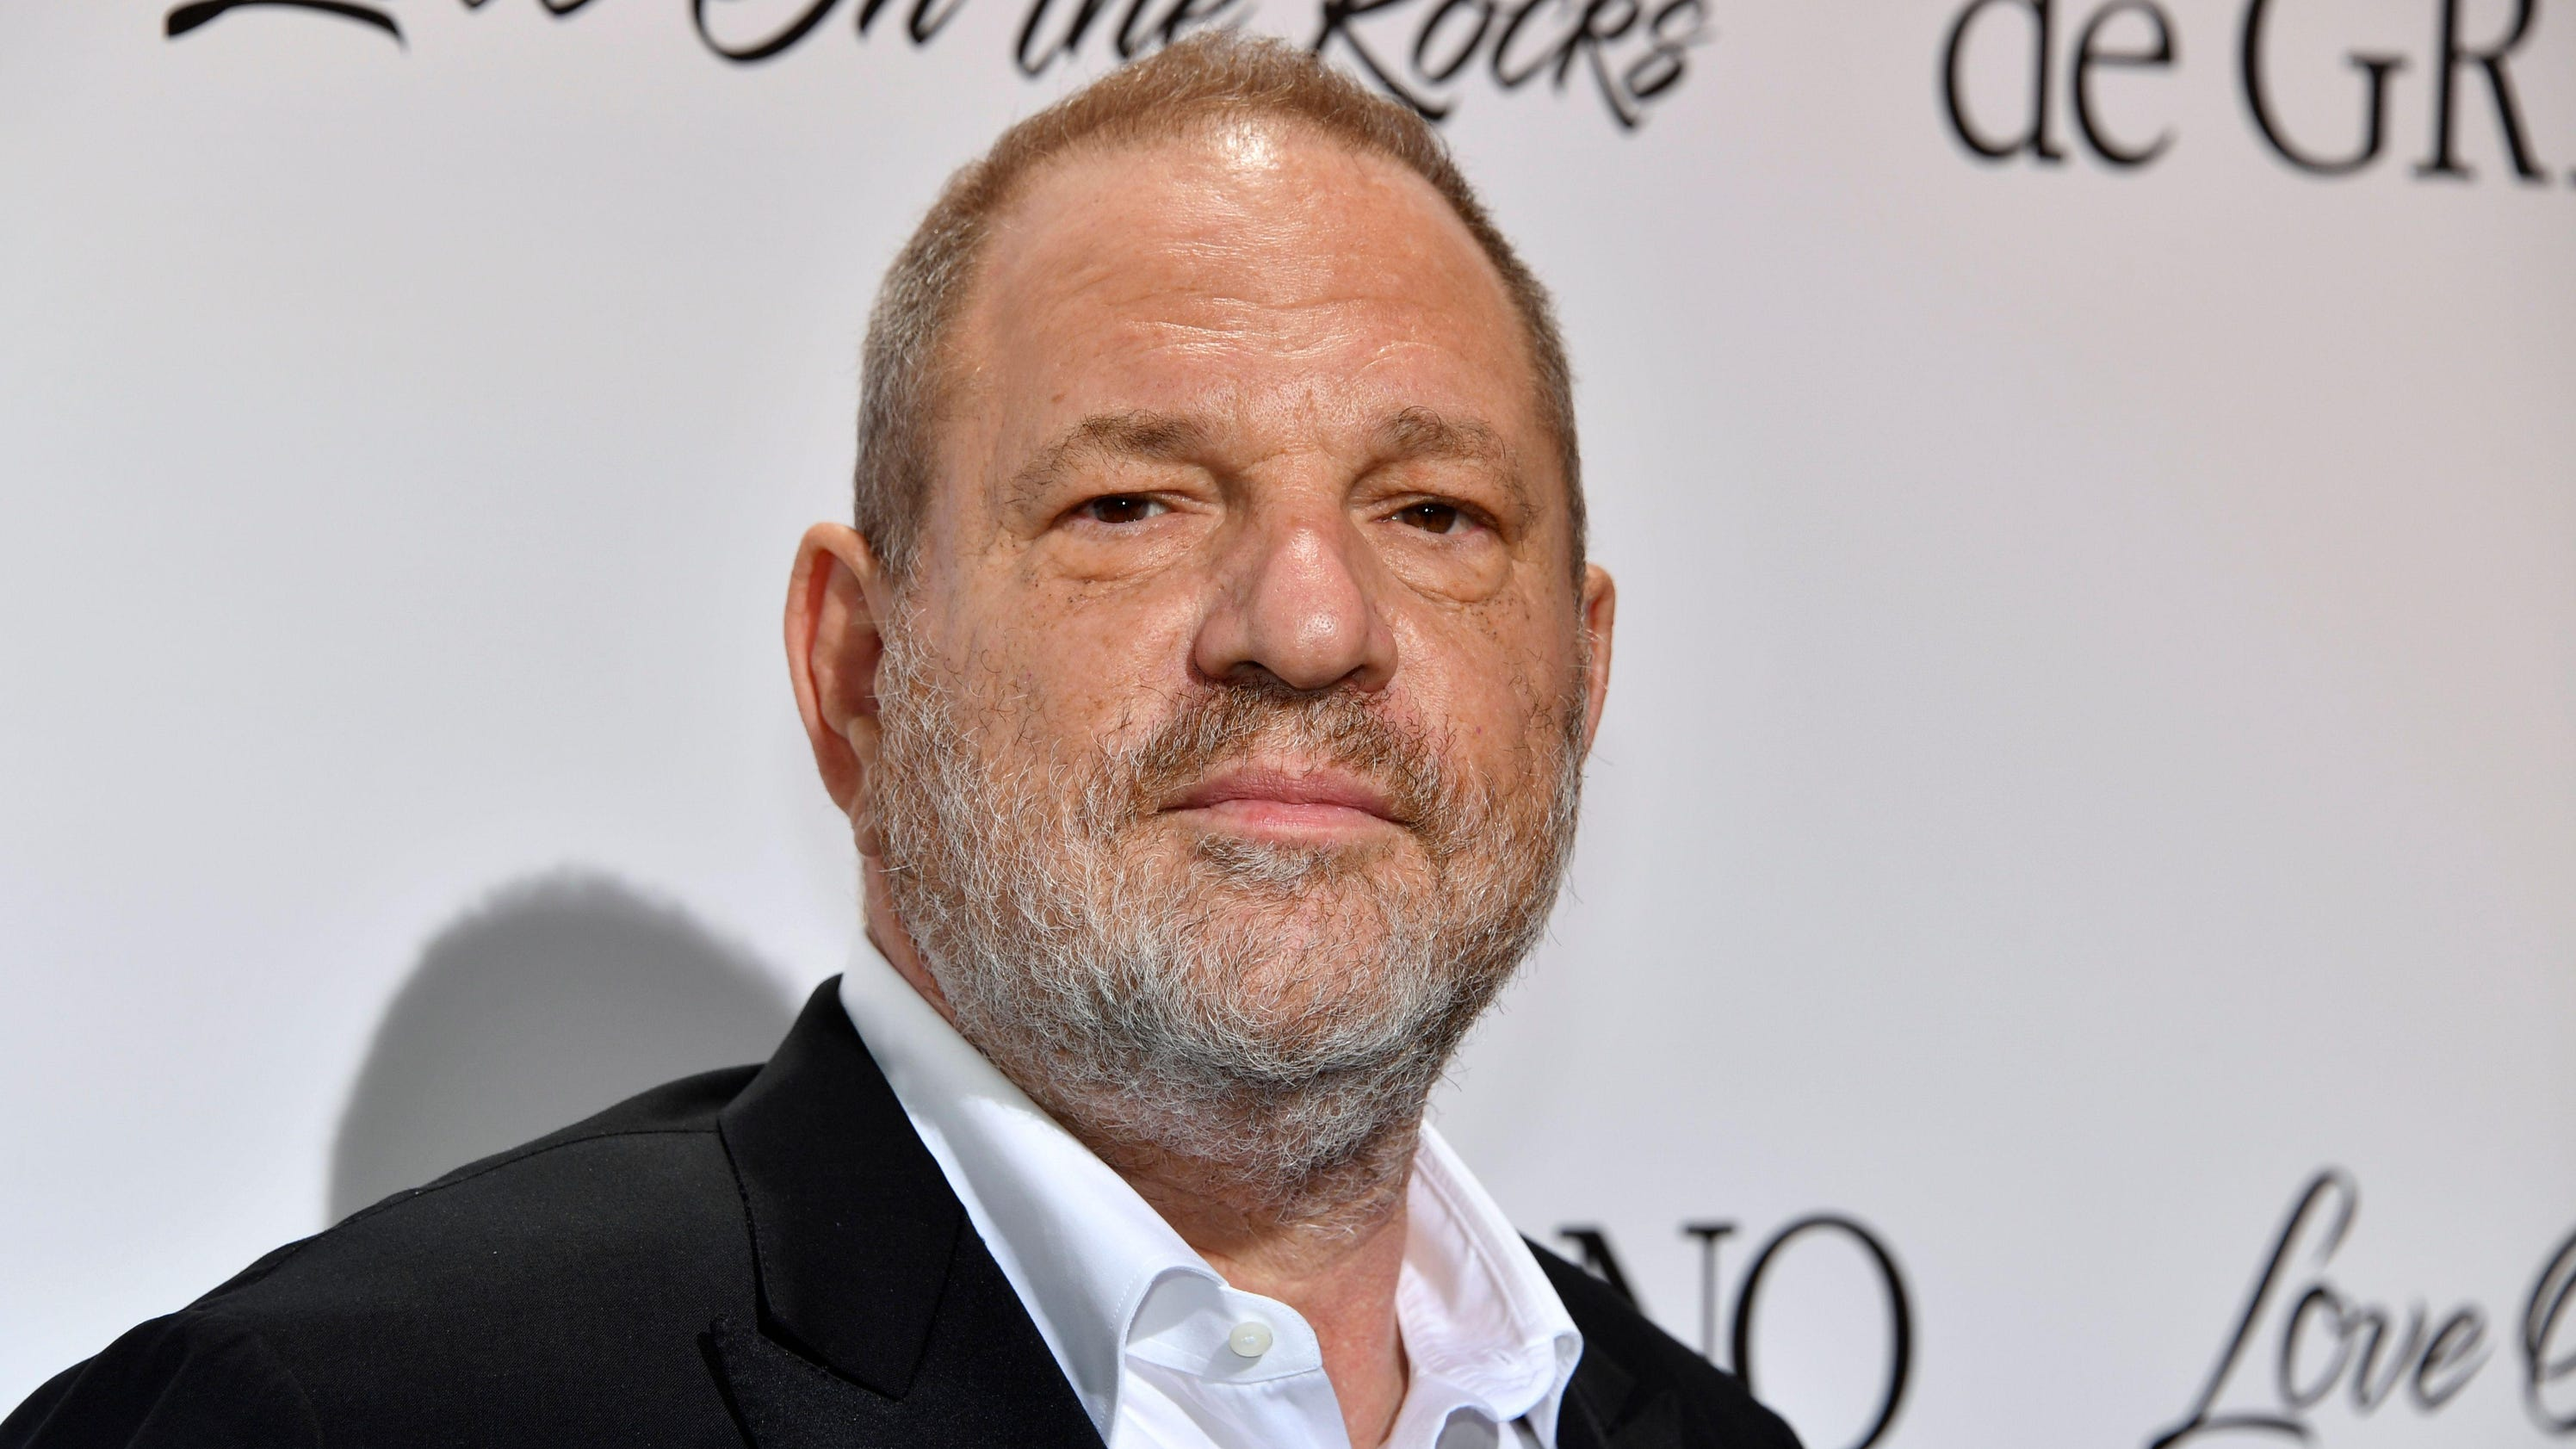 bf53af9f554de thenewstribune.com  SNL  gives passing notice to Harvey Weinstein